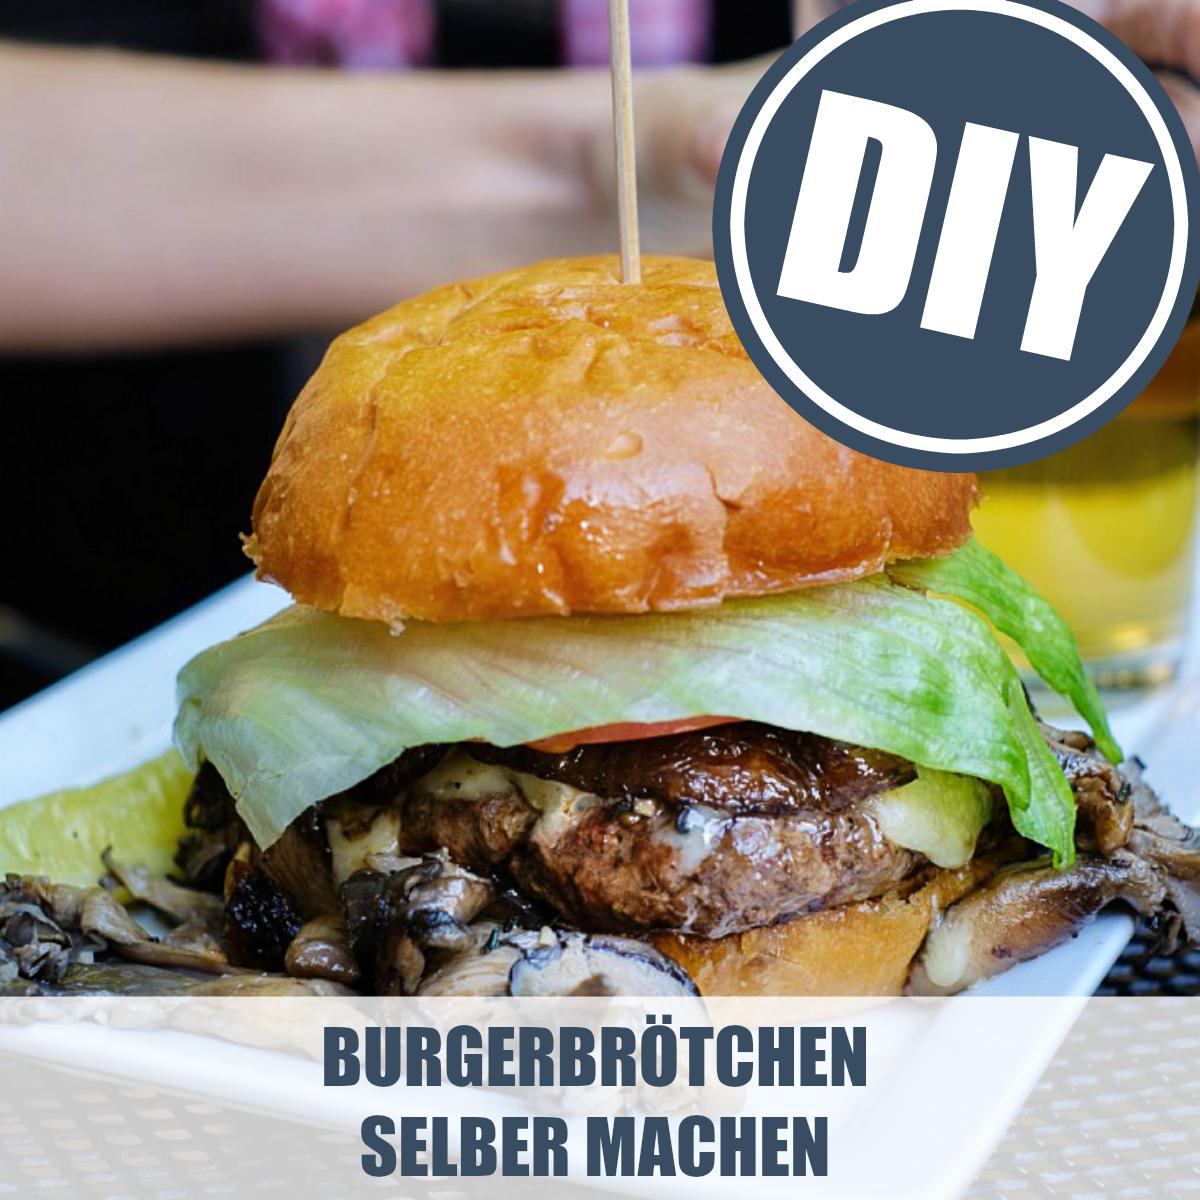 burger br tchen selber backen do it yourself tutorials pinterest. Black Bedroom Furniture Sets. Home Design Ideas